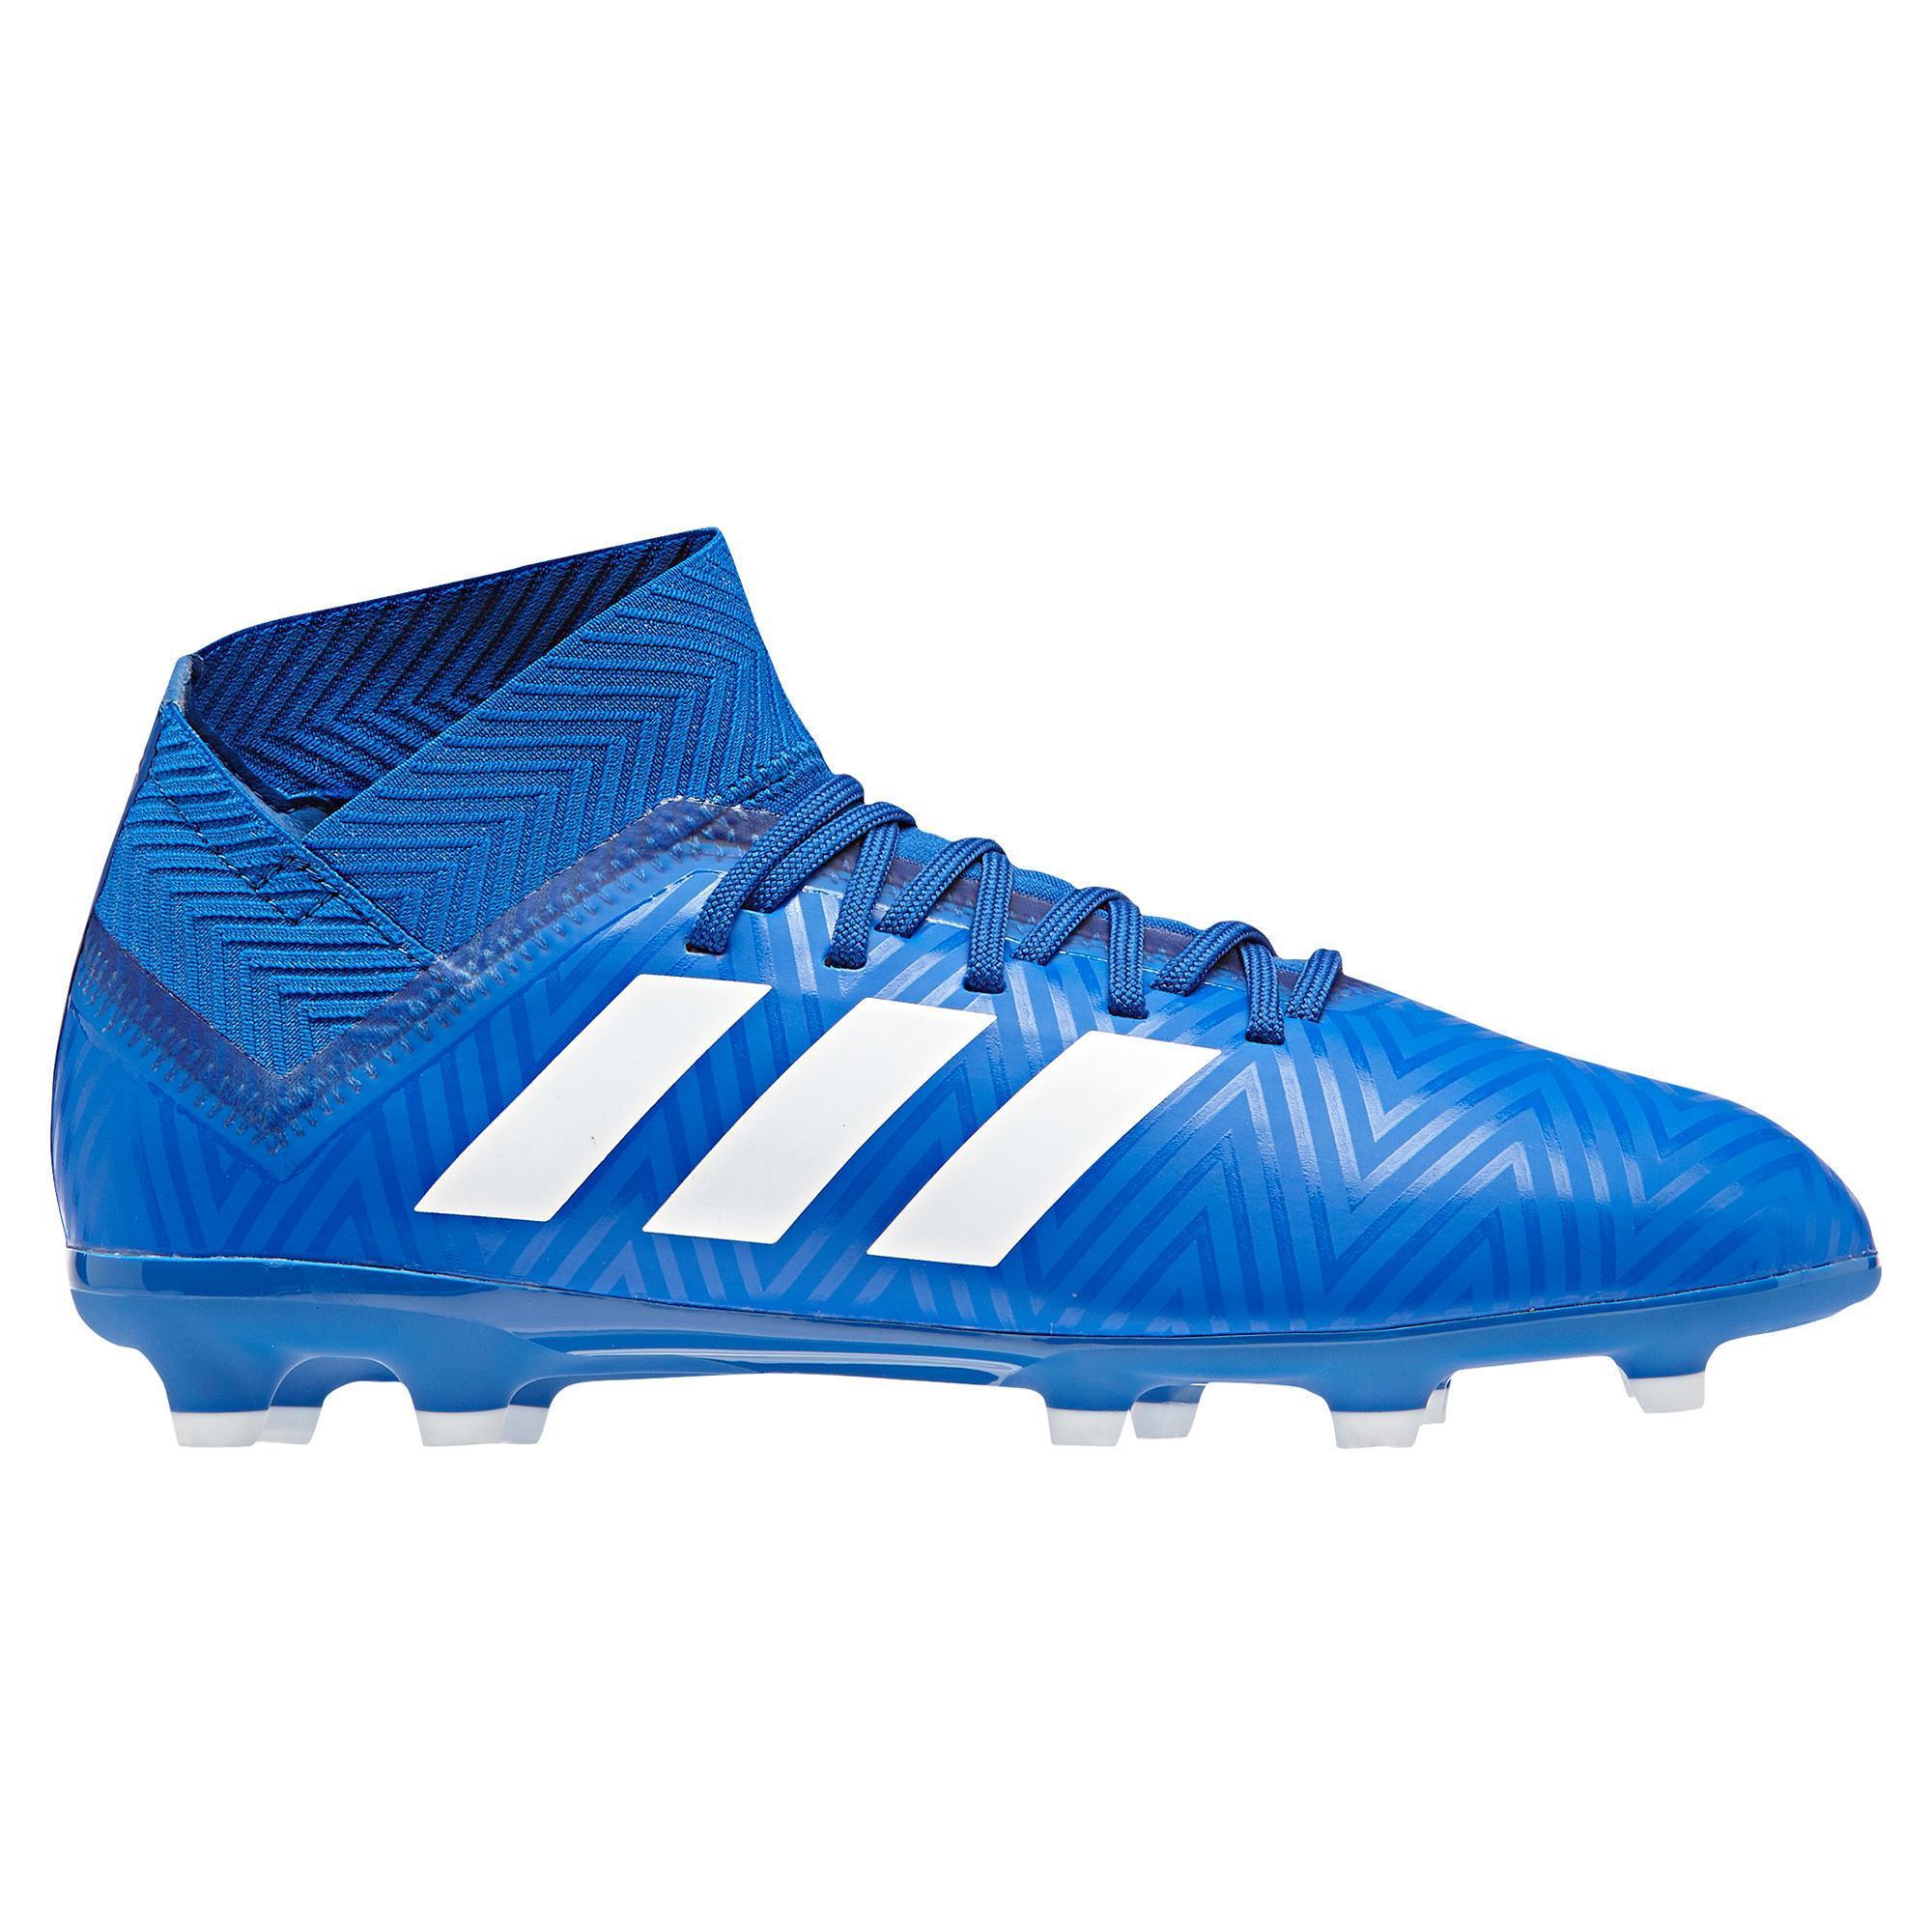 Botas de fútbol niños Nemeziz 3 FG azul Adidas  4b8d63784c01e